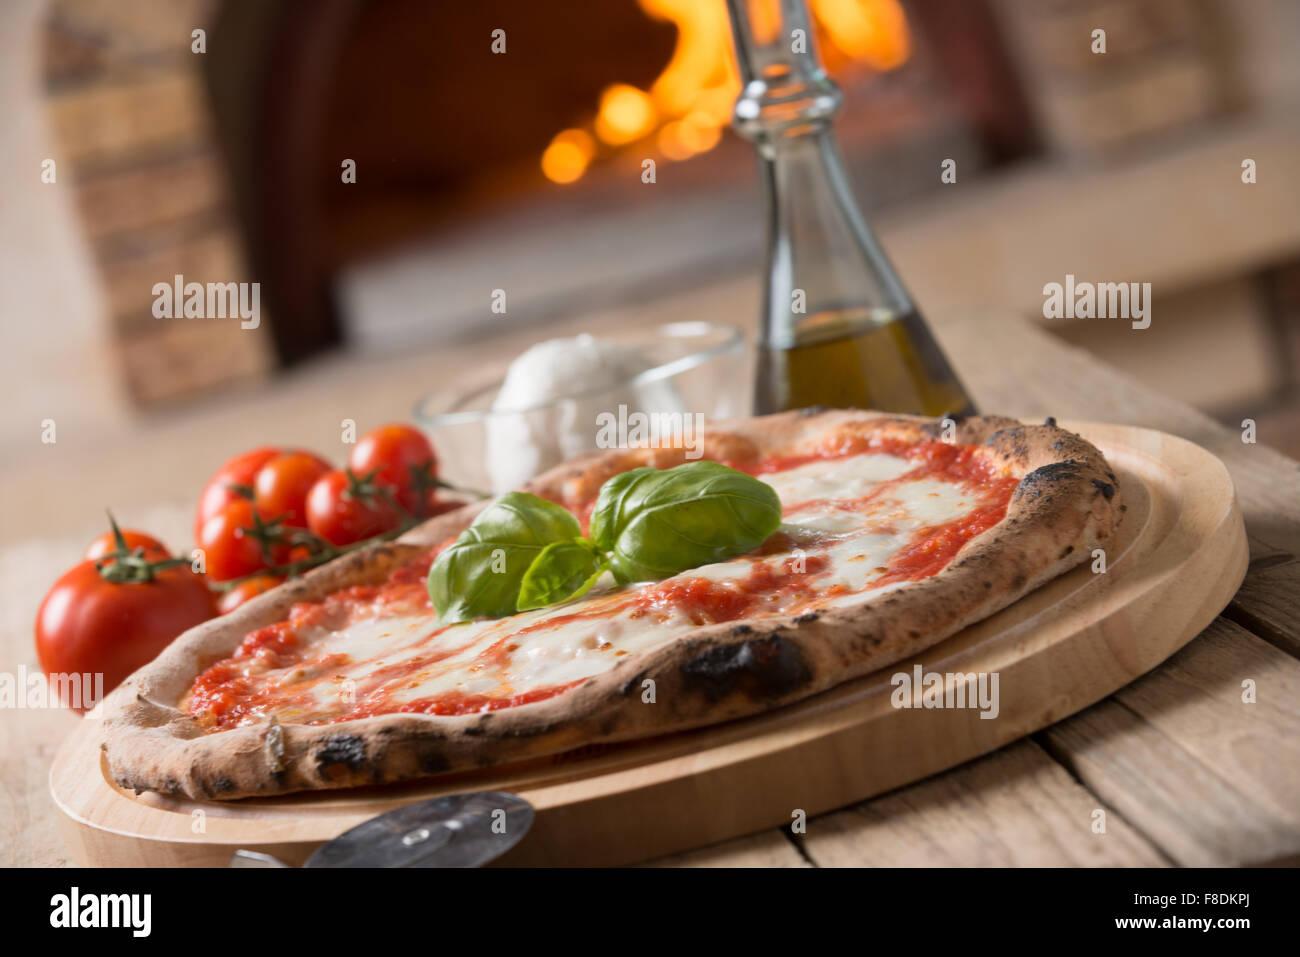 Holzofen gebacken italienische Pizza margherita Stockbild